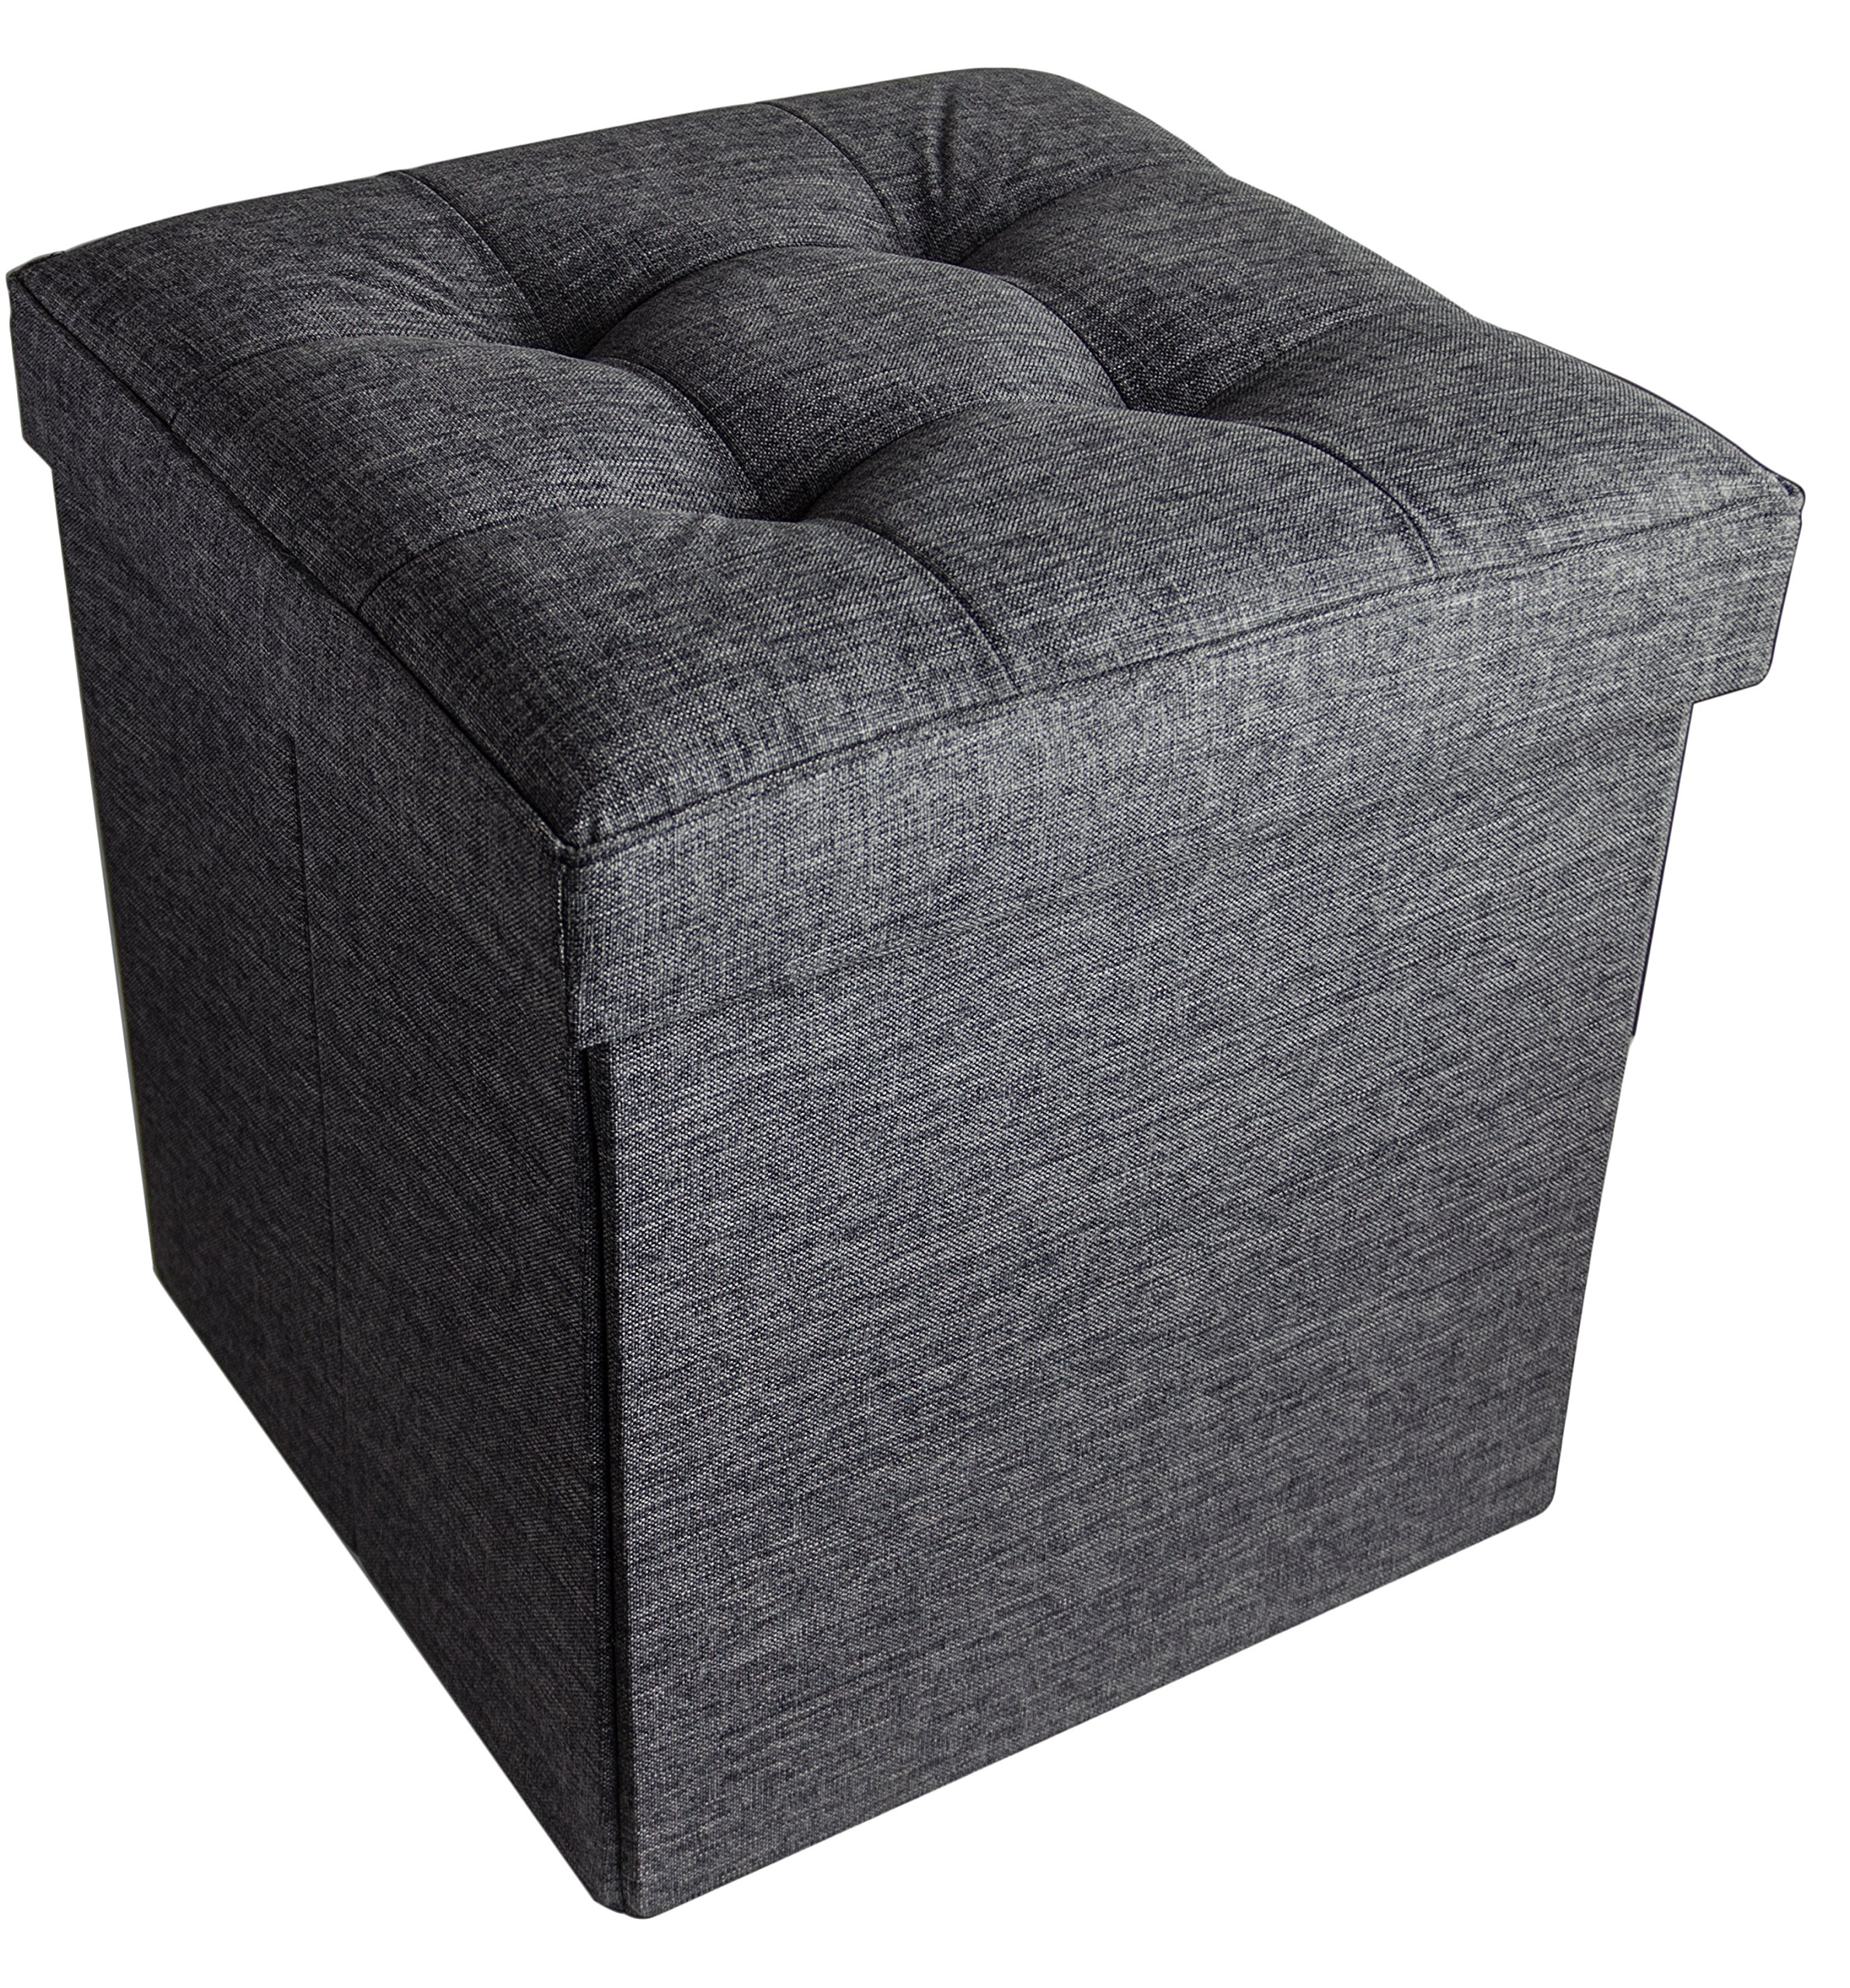 Folding Cube Storage Ottoman with Padded Seat, 15'' x 15'' - Asphalt Black